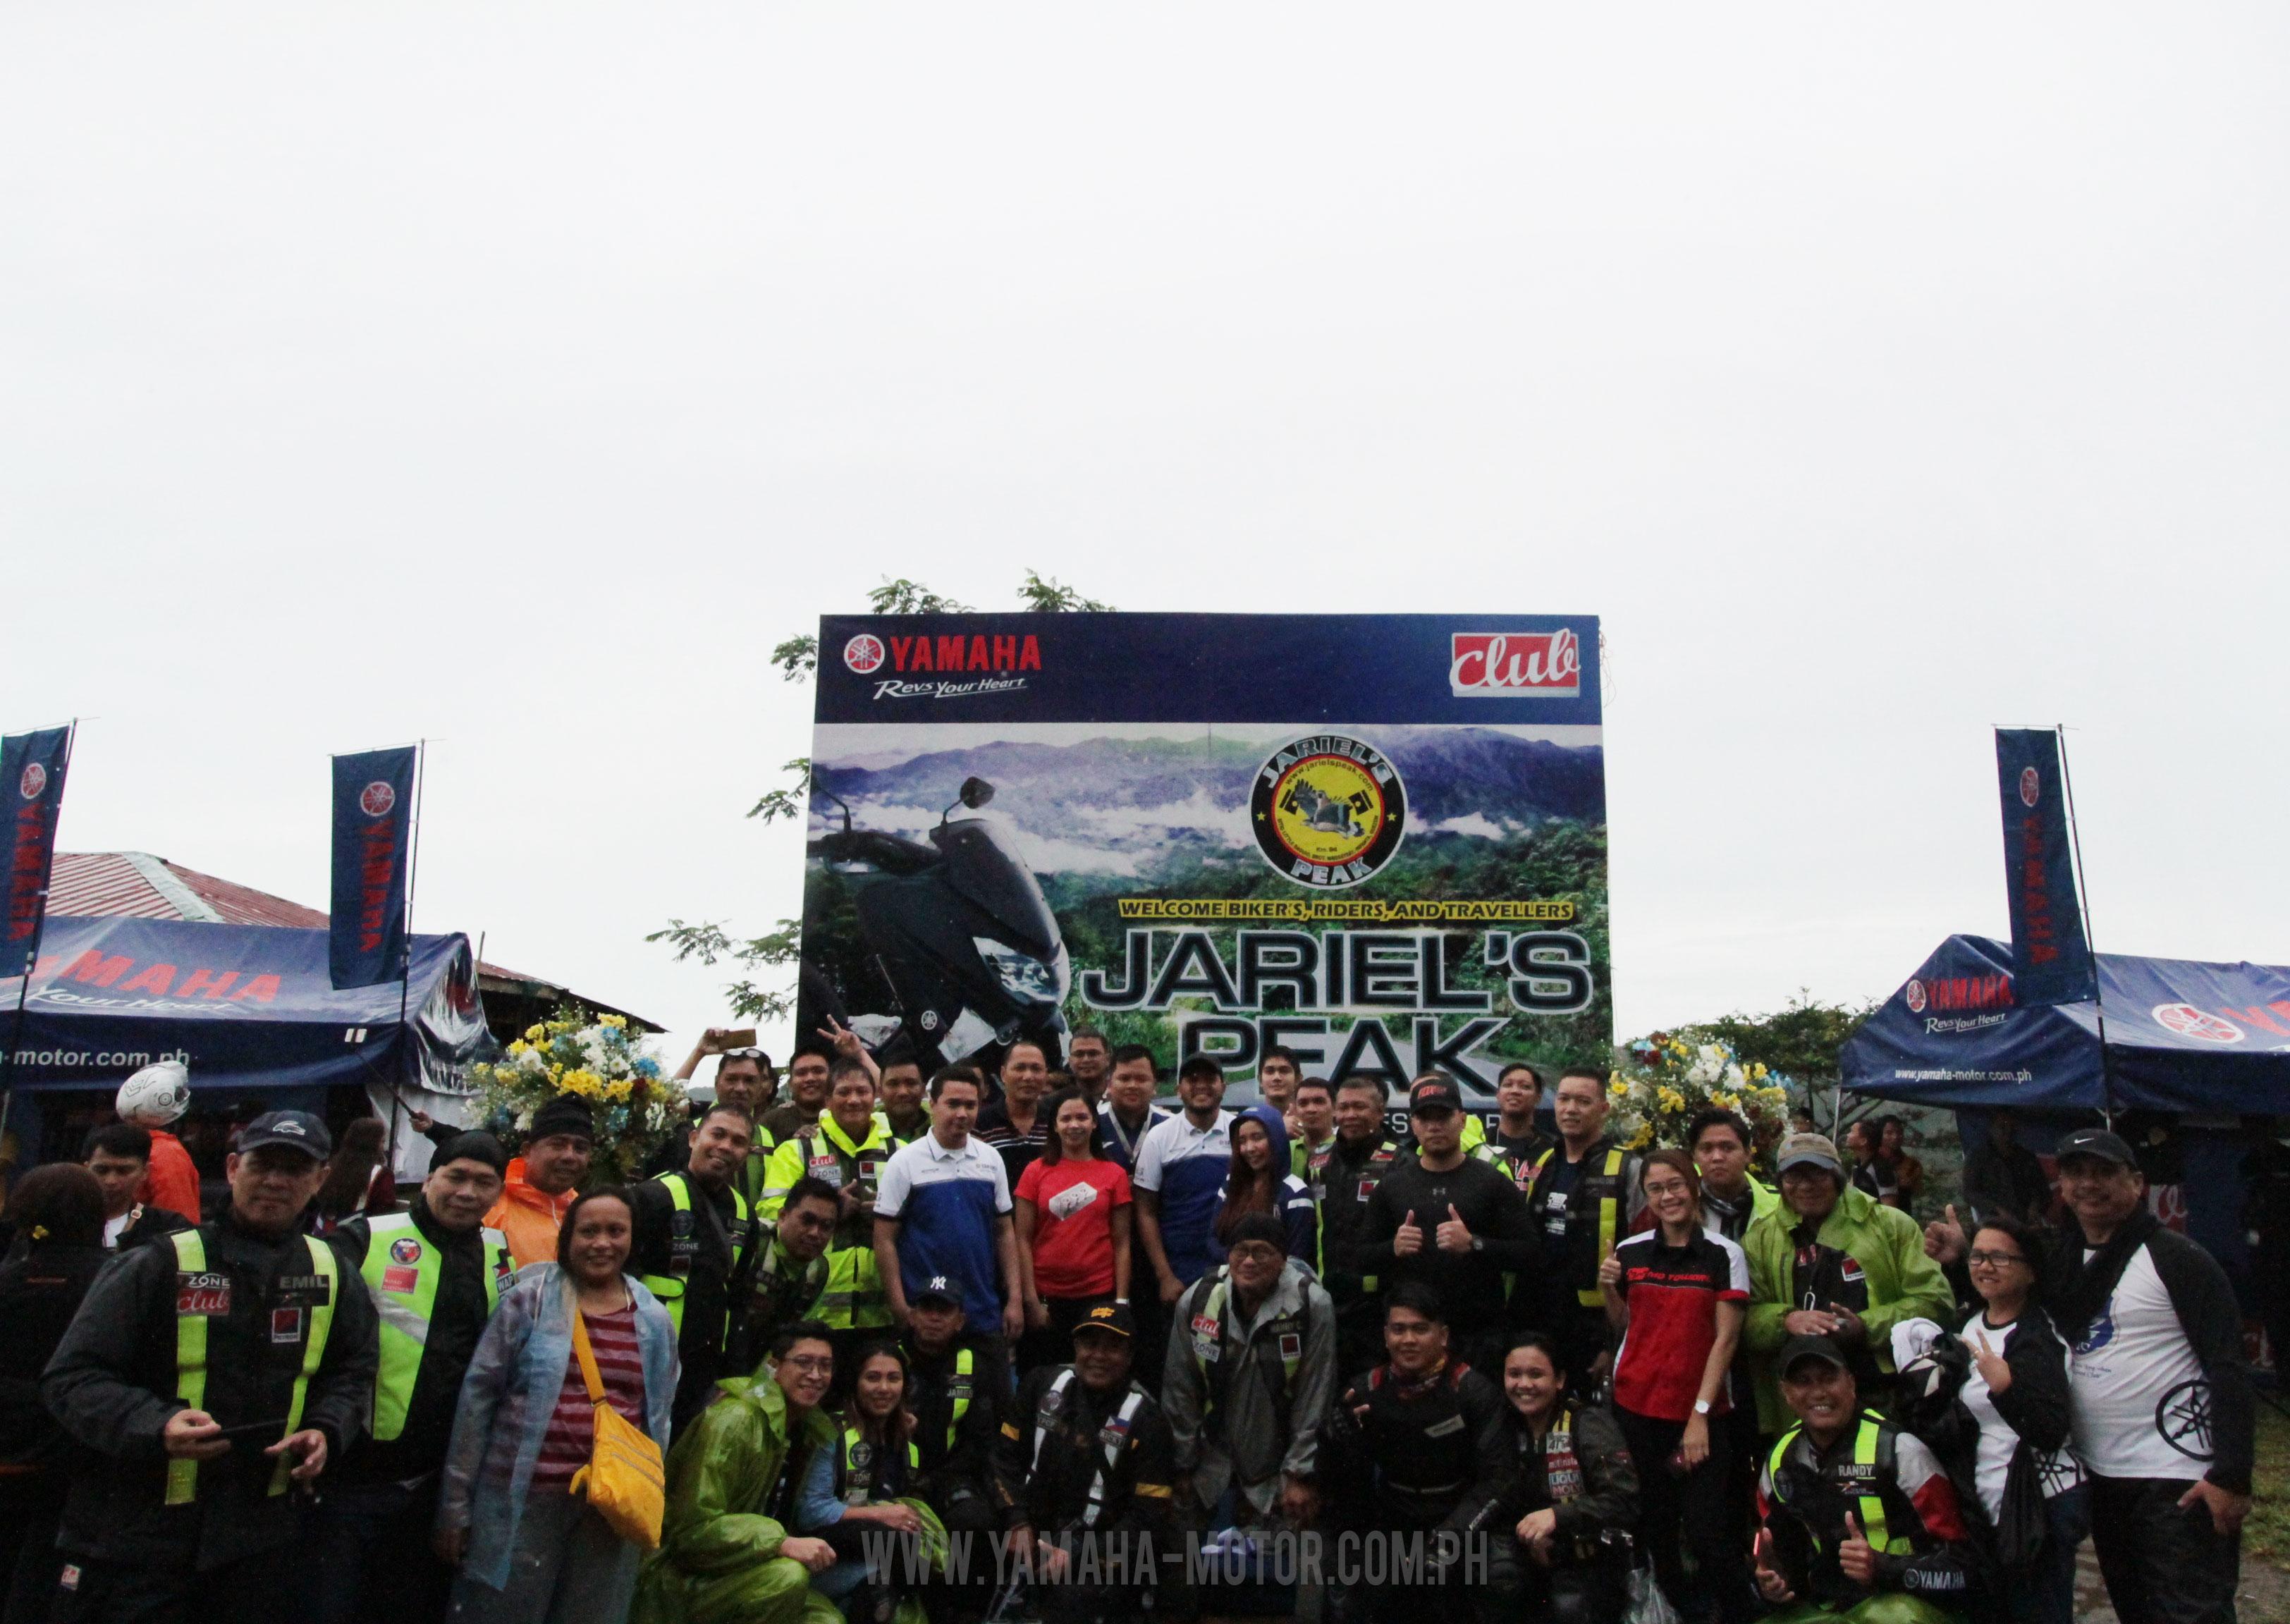 The Yamaha Club Return To Jariels Peak Inside Racing